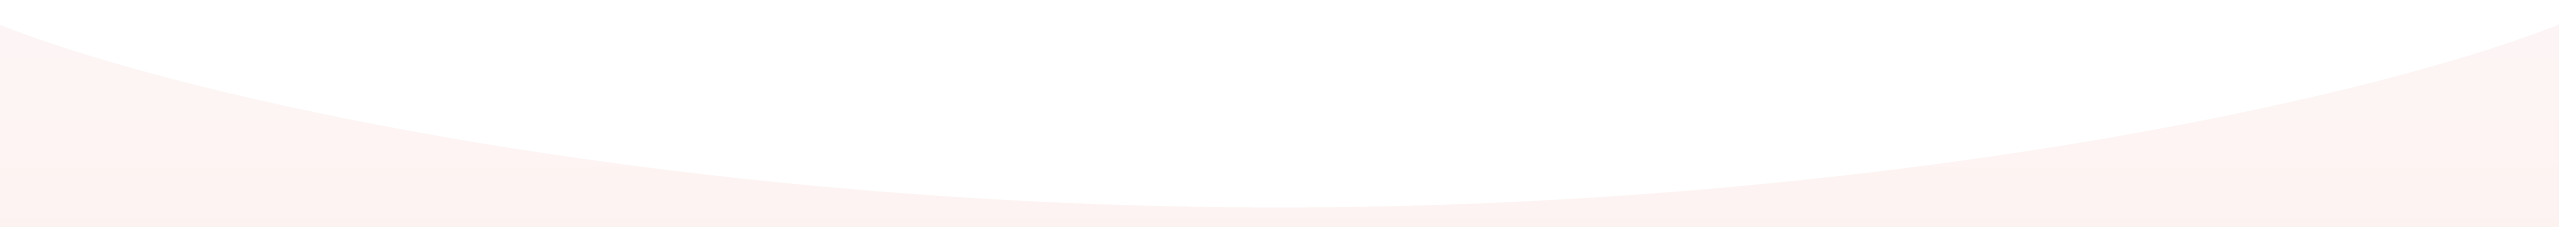 弘前大学大学院医学研究科麻酔科学講座フッターイメージ